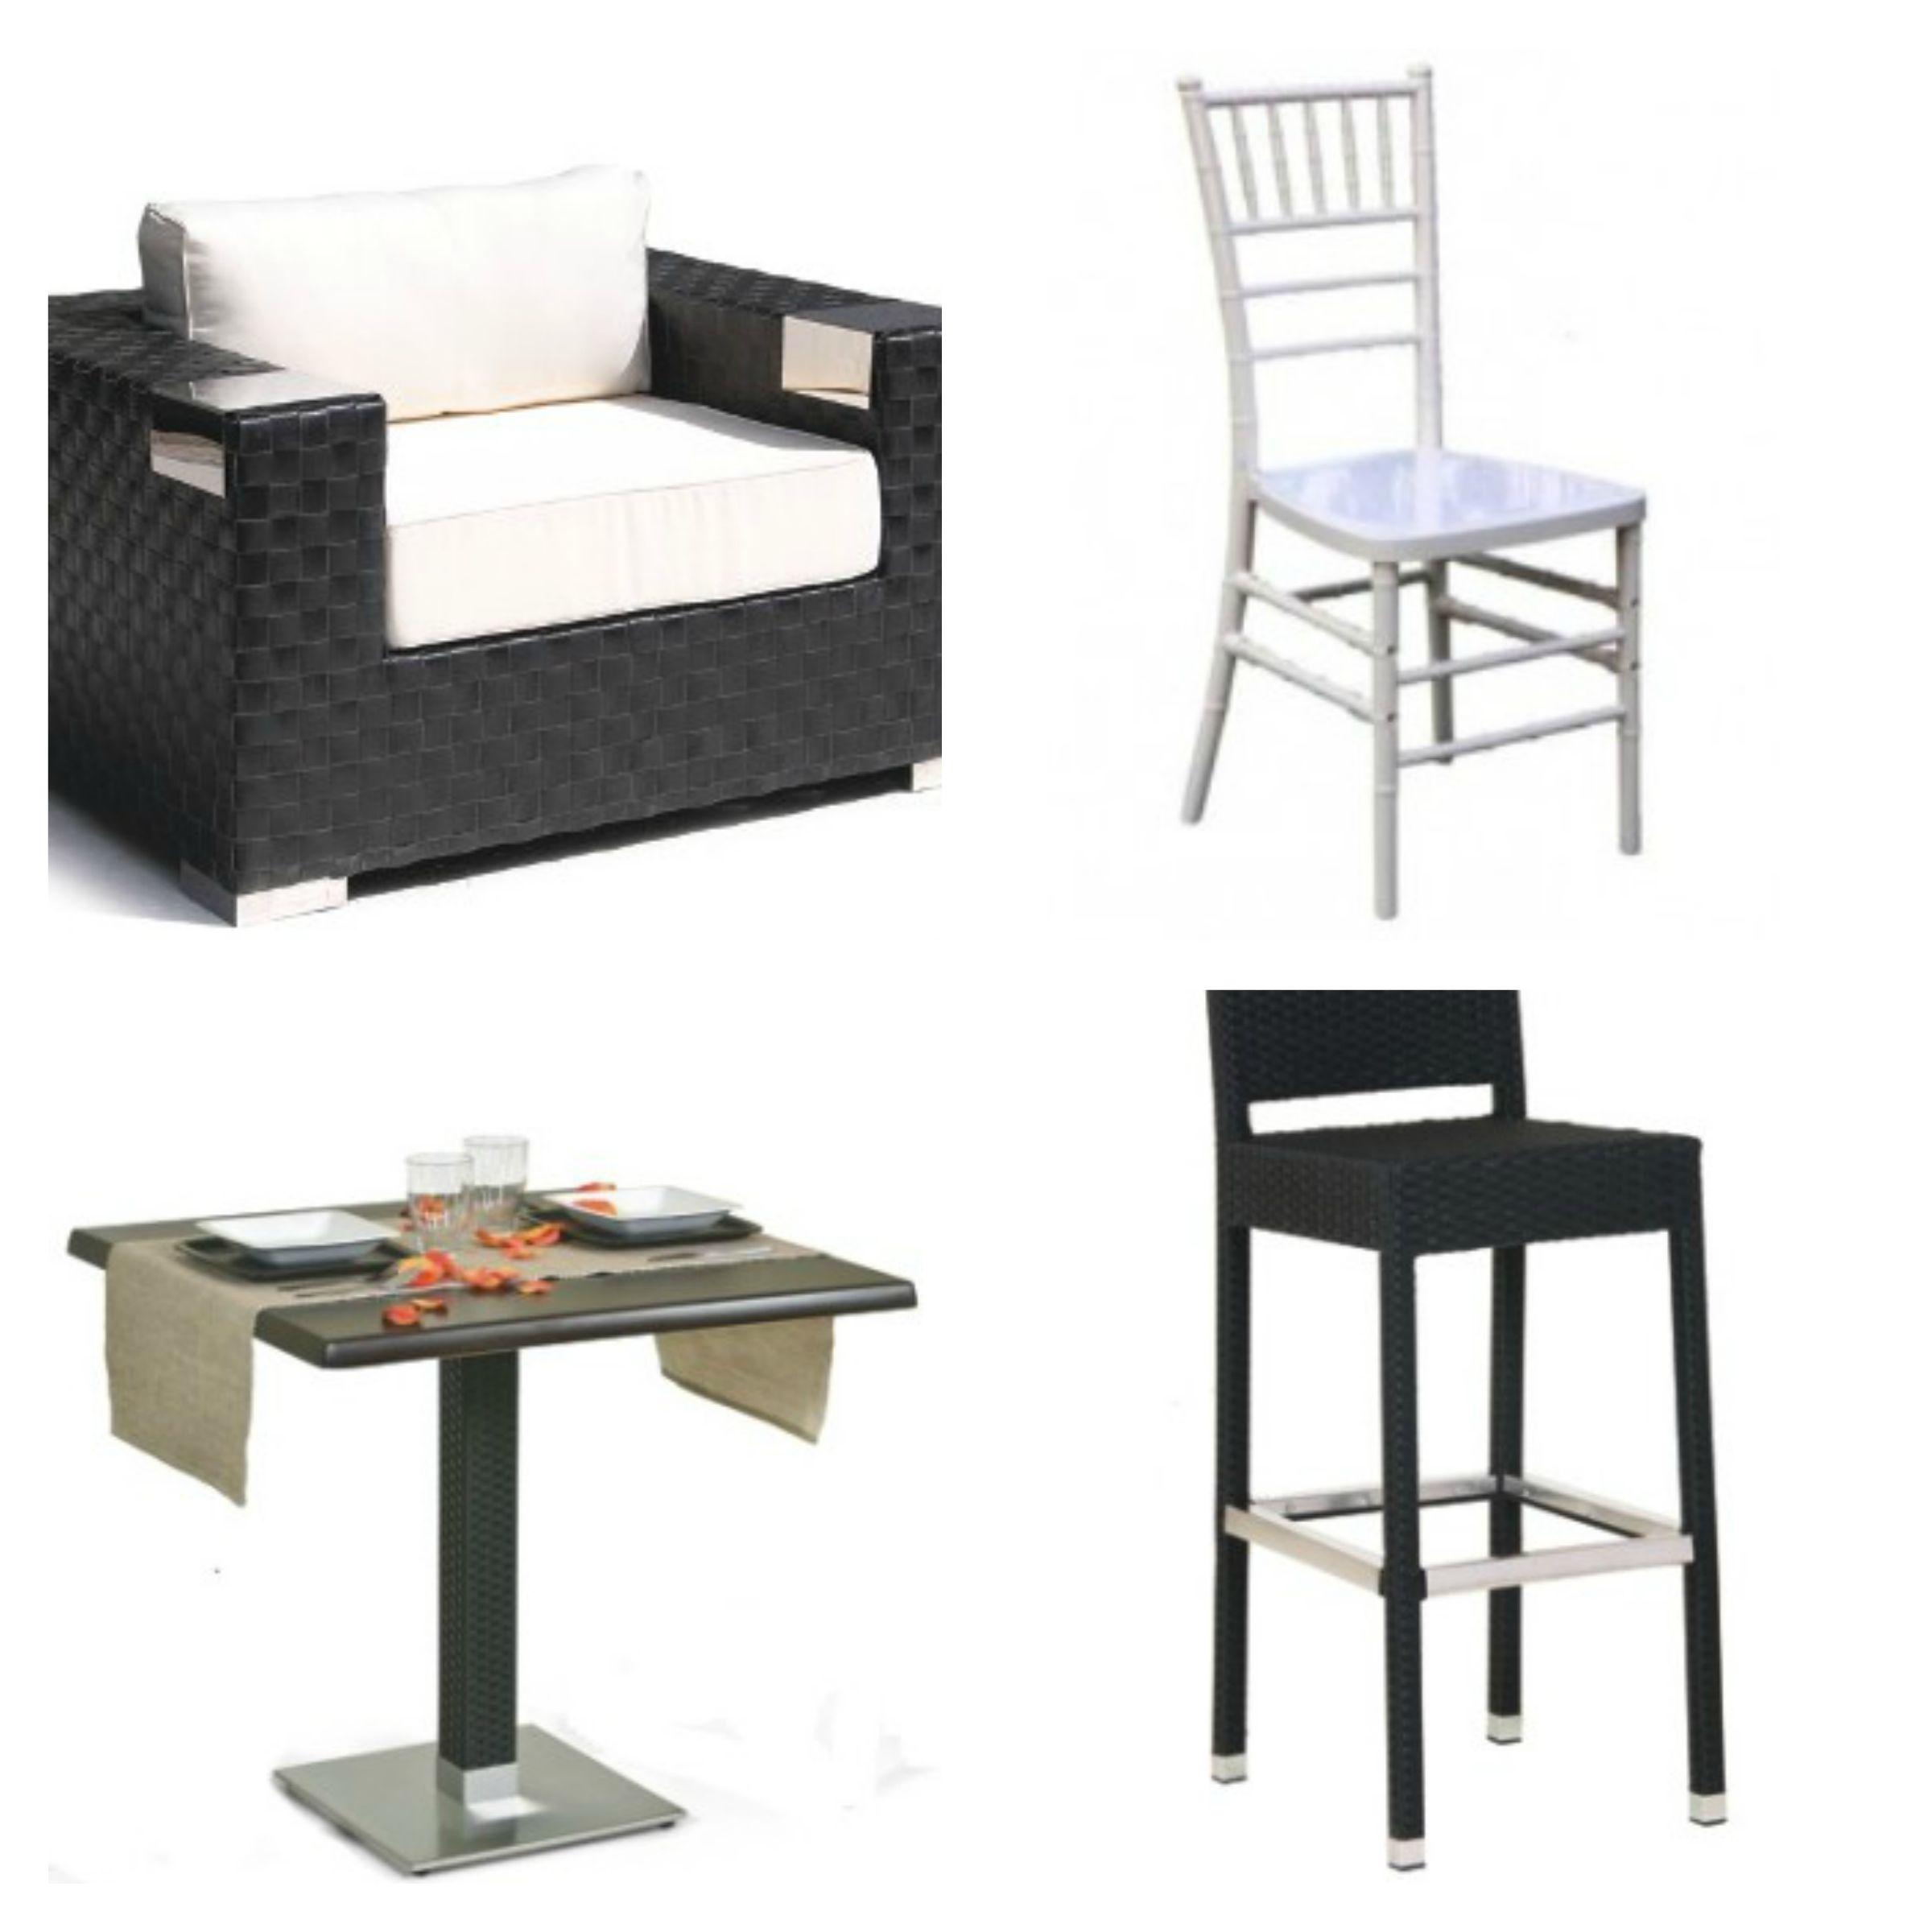 Sedie per hotel emerson - Tavoli e sedie per gelateria ...